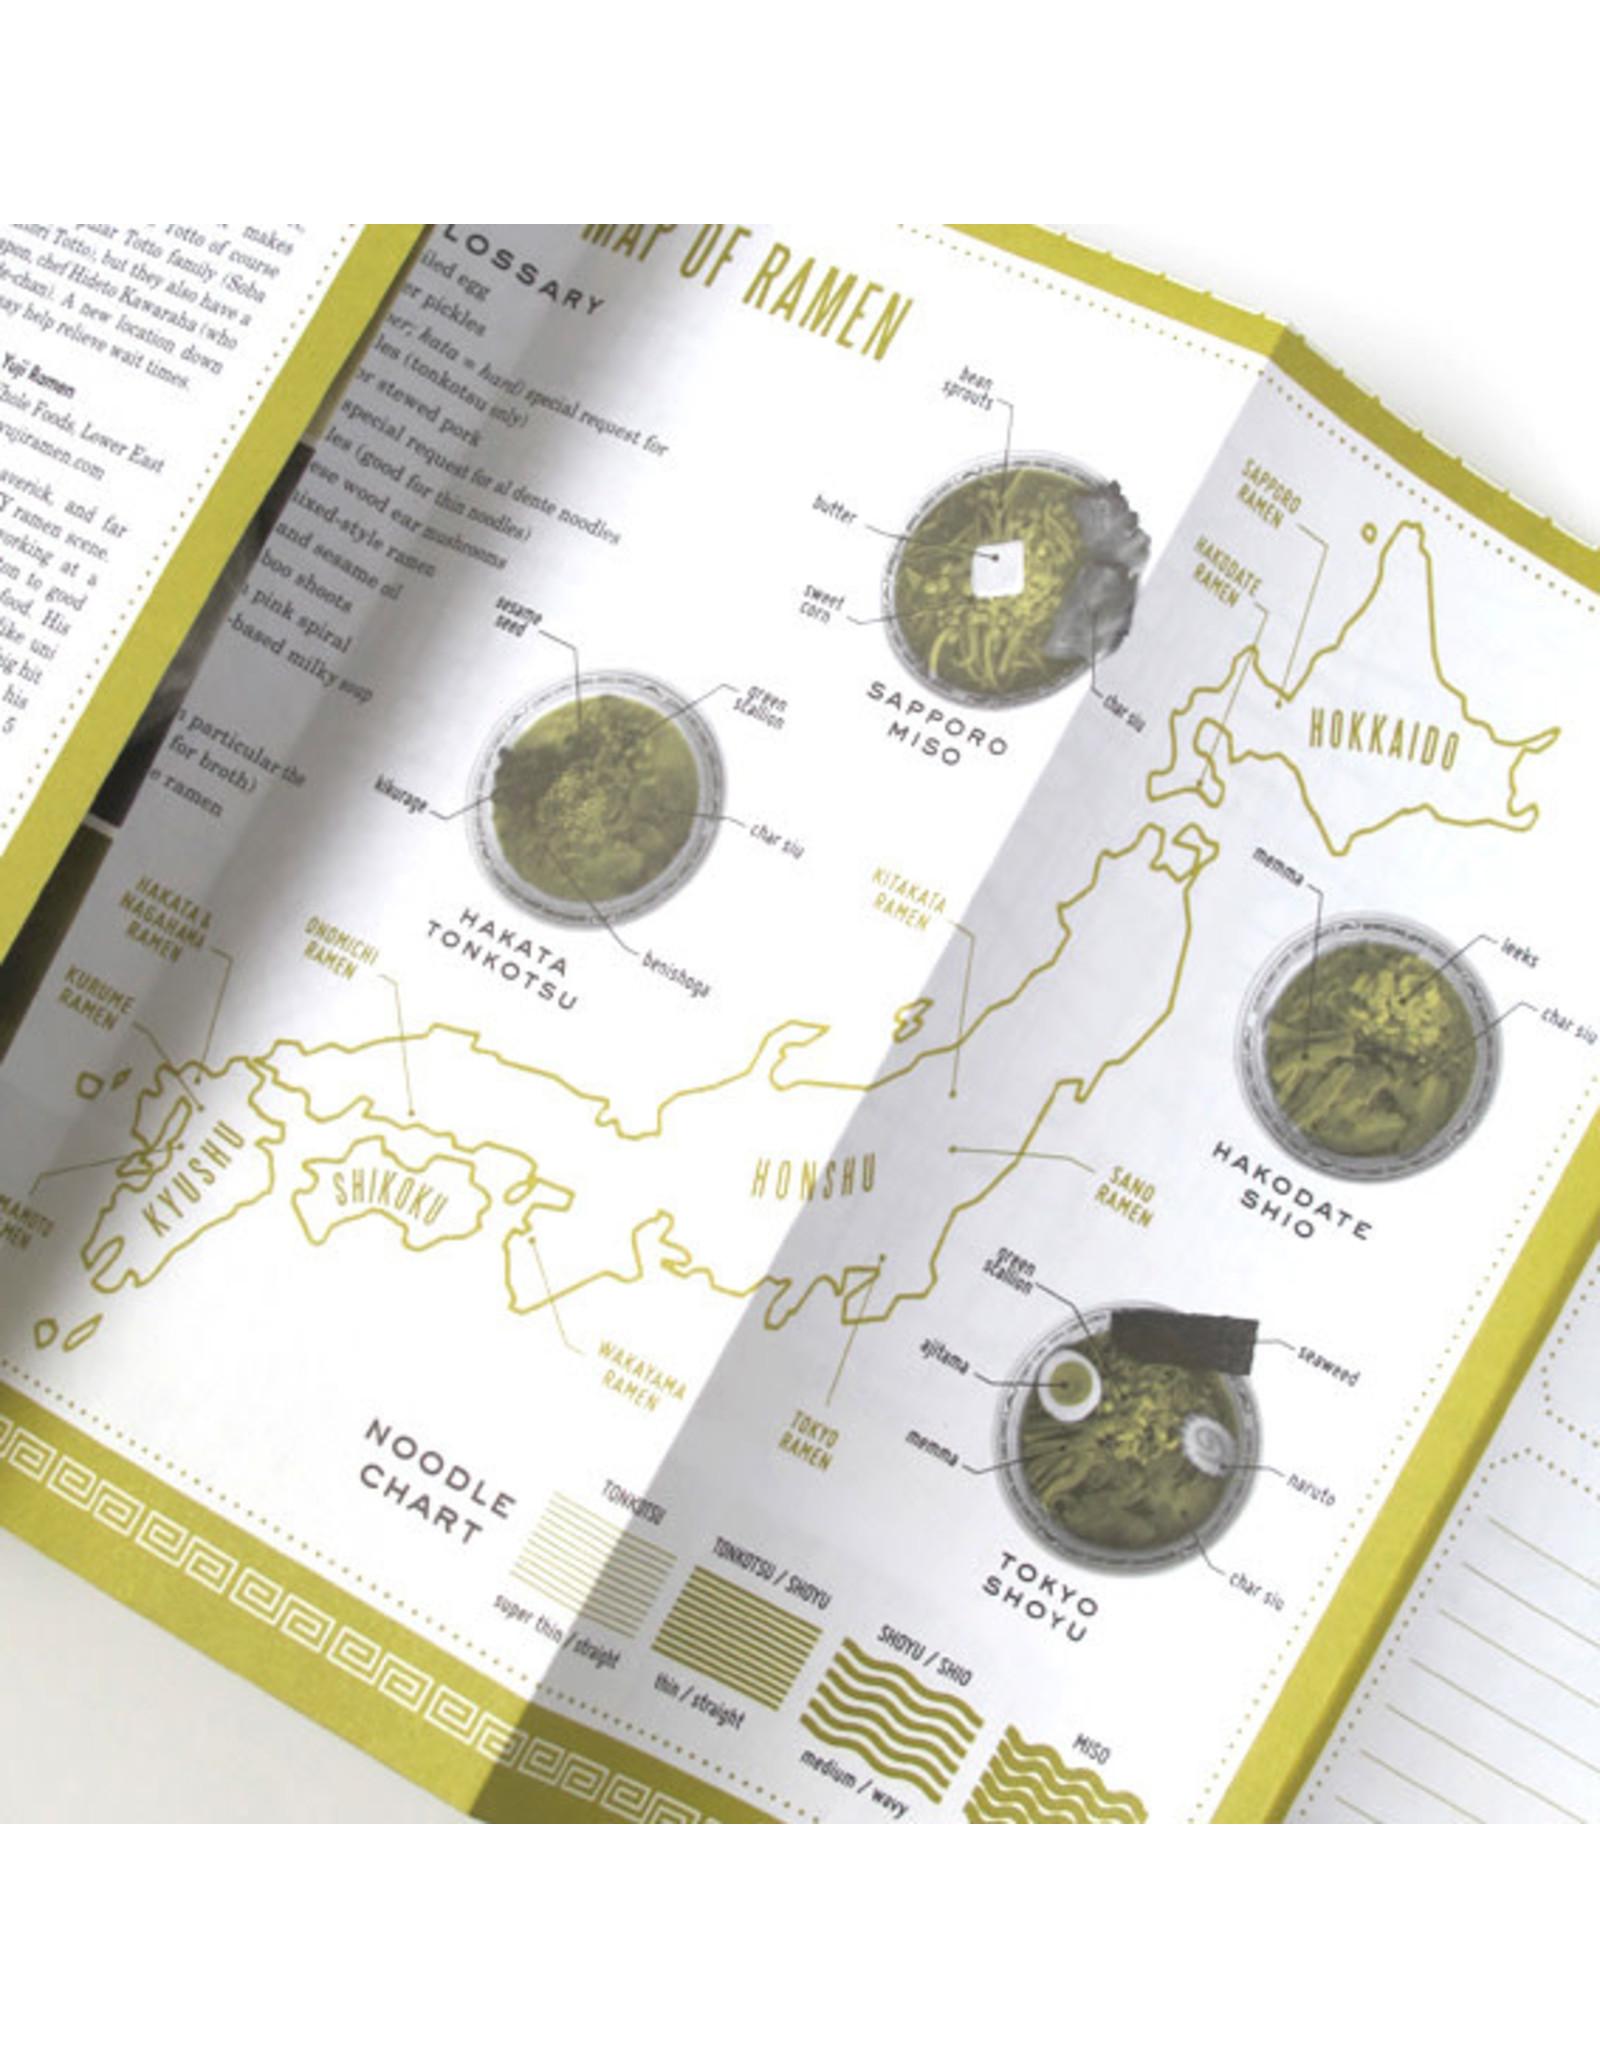 New York Ramen Map